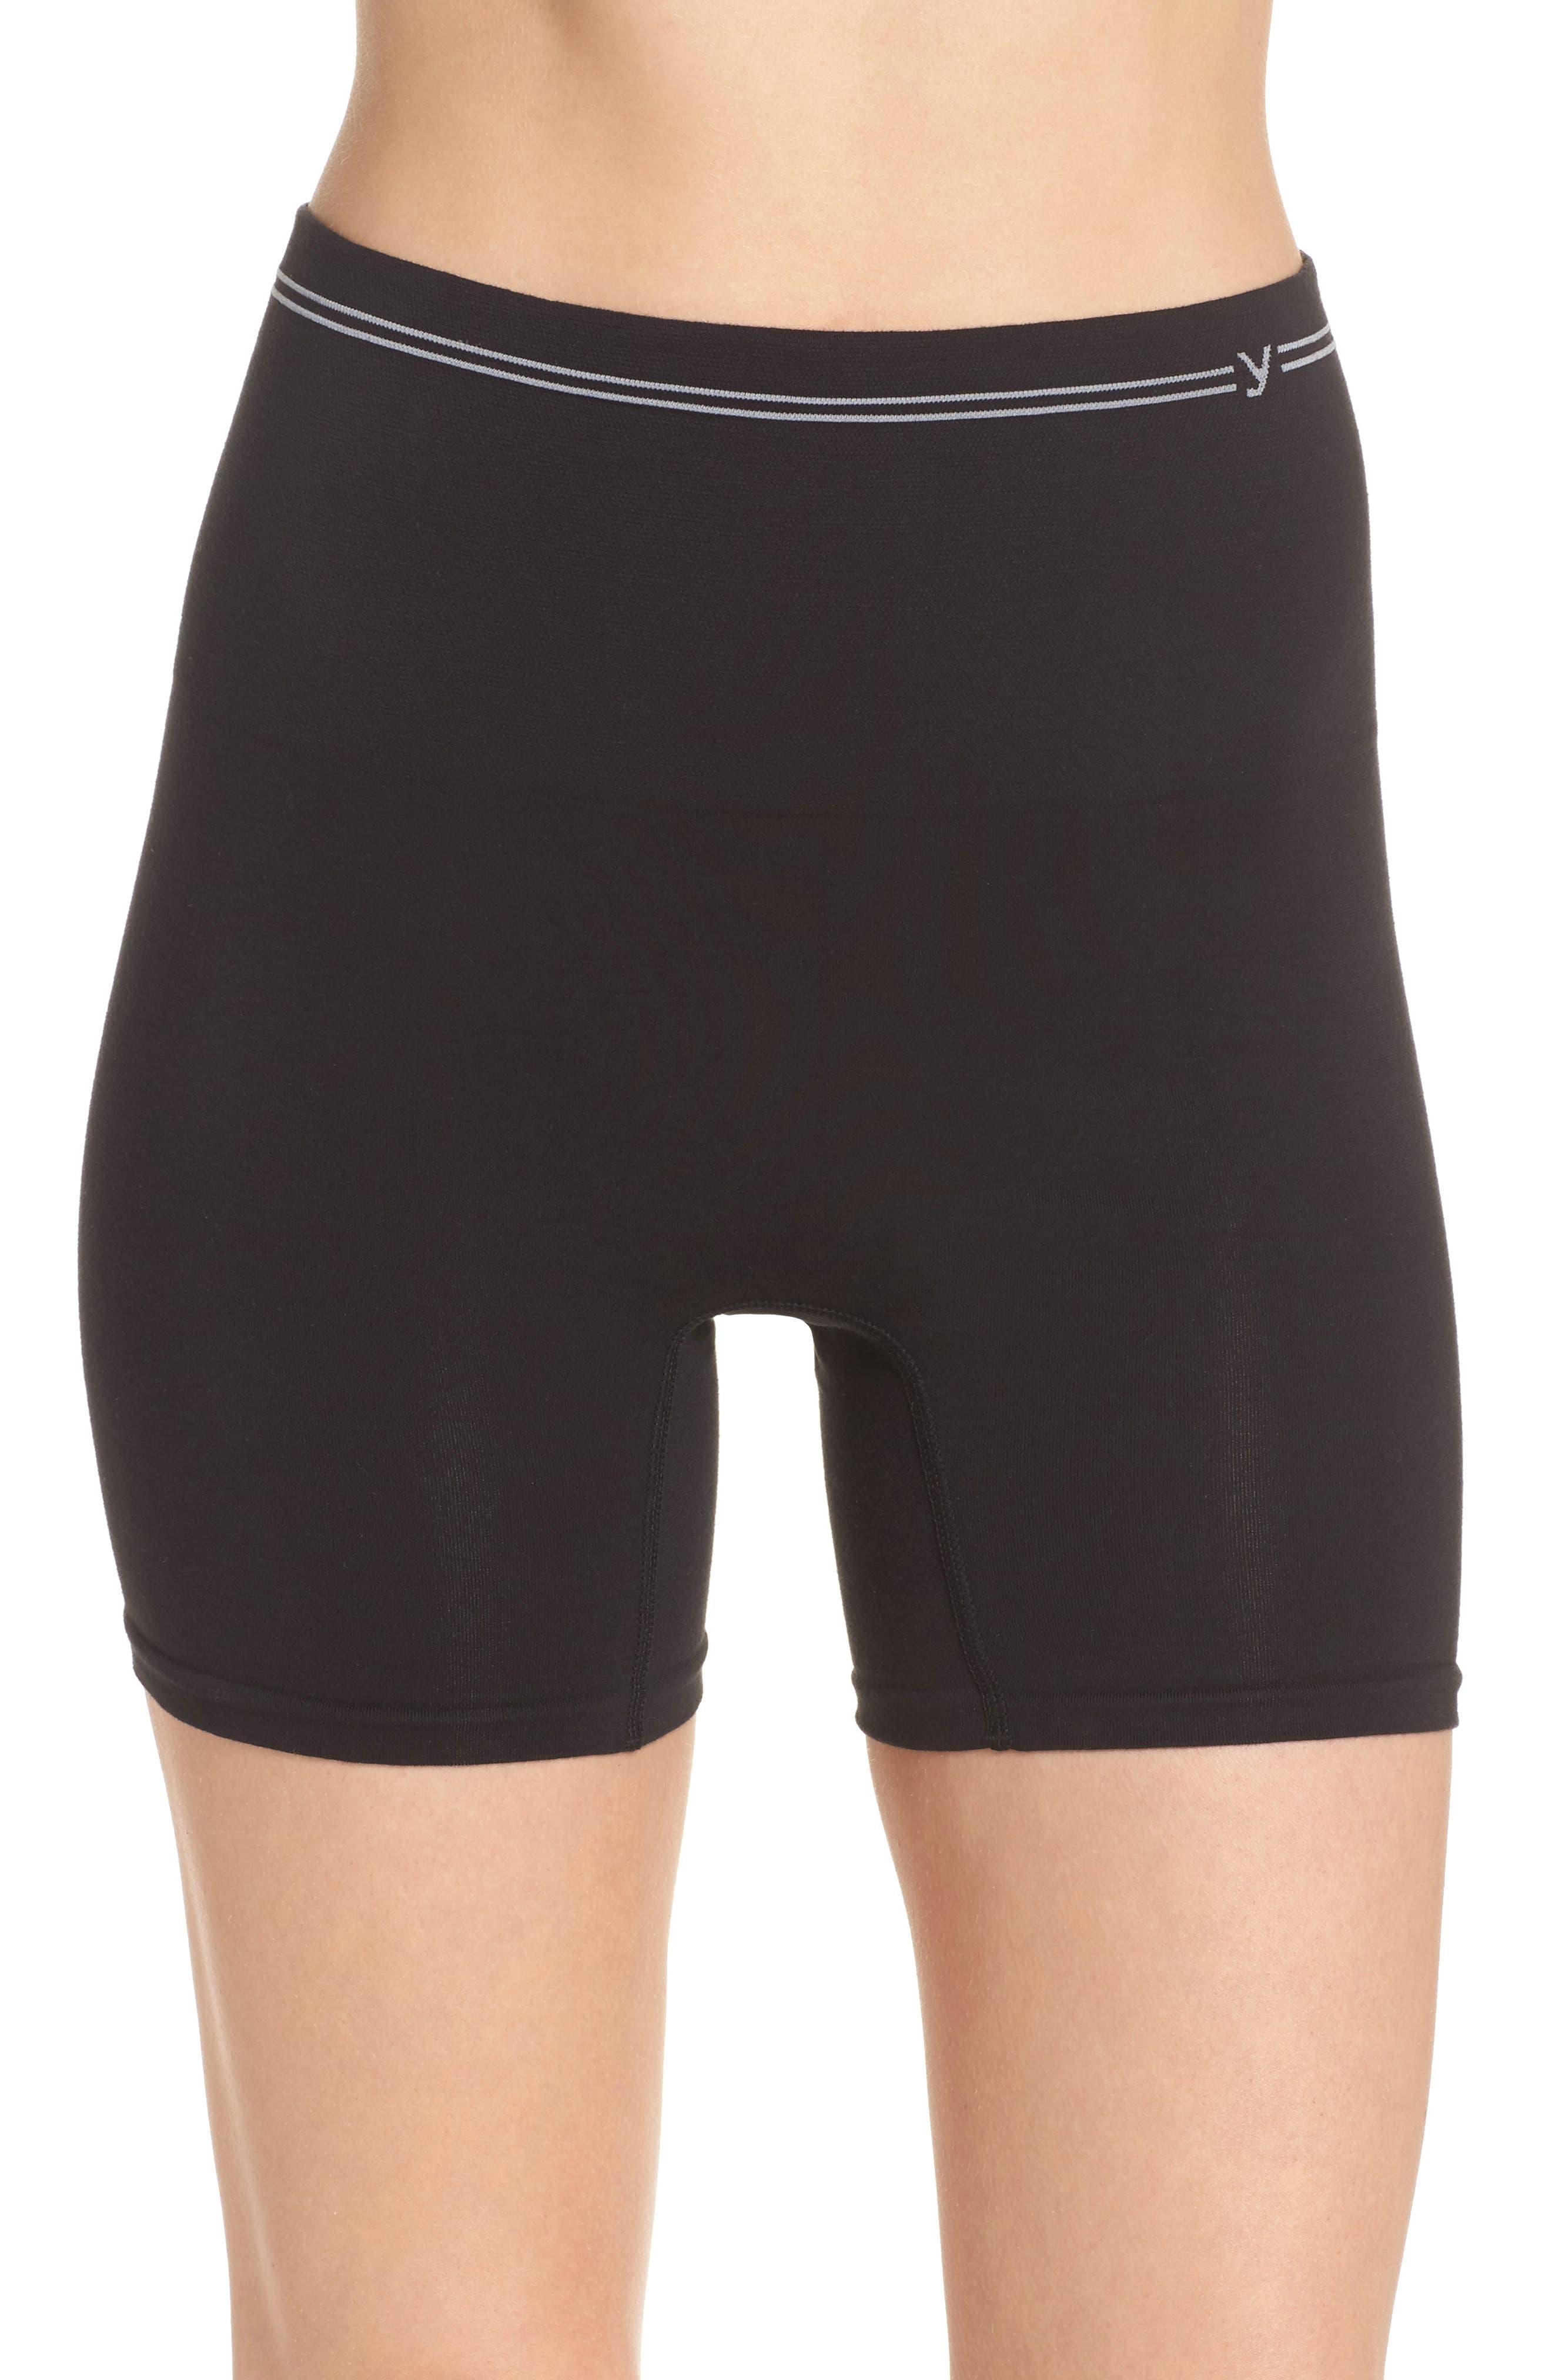 YUMMIE Seamless Shaping Shorts, Main, color, 001